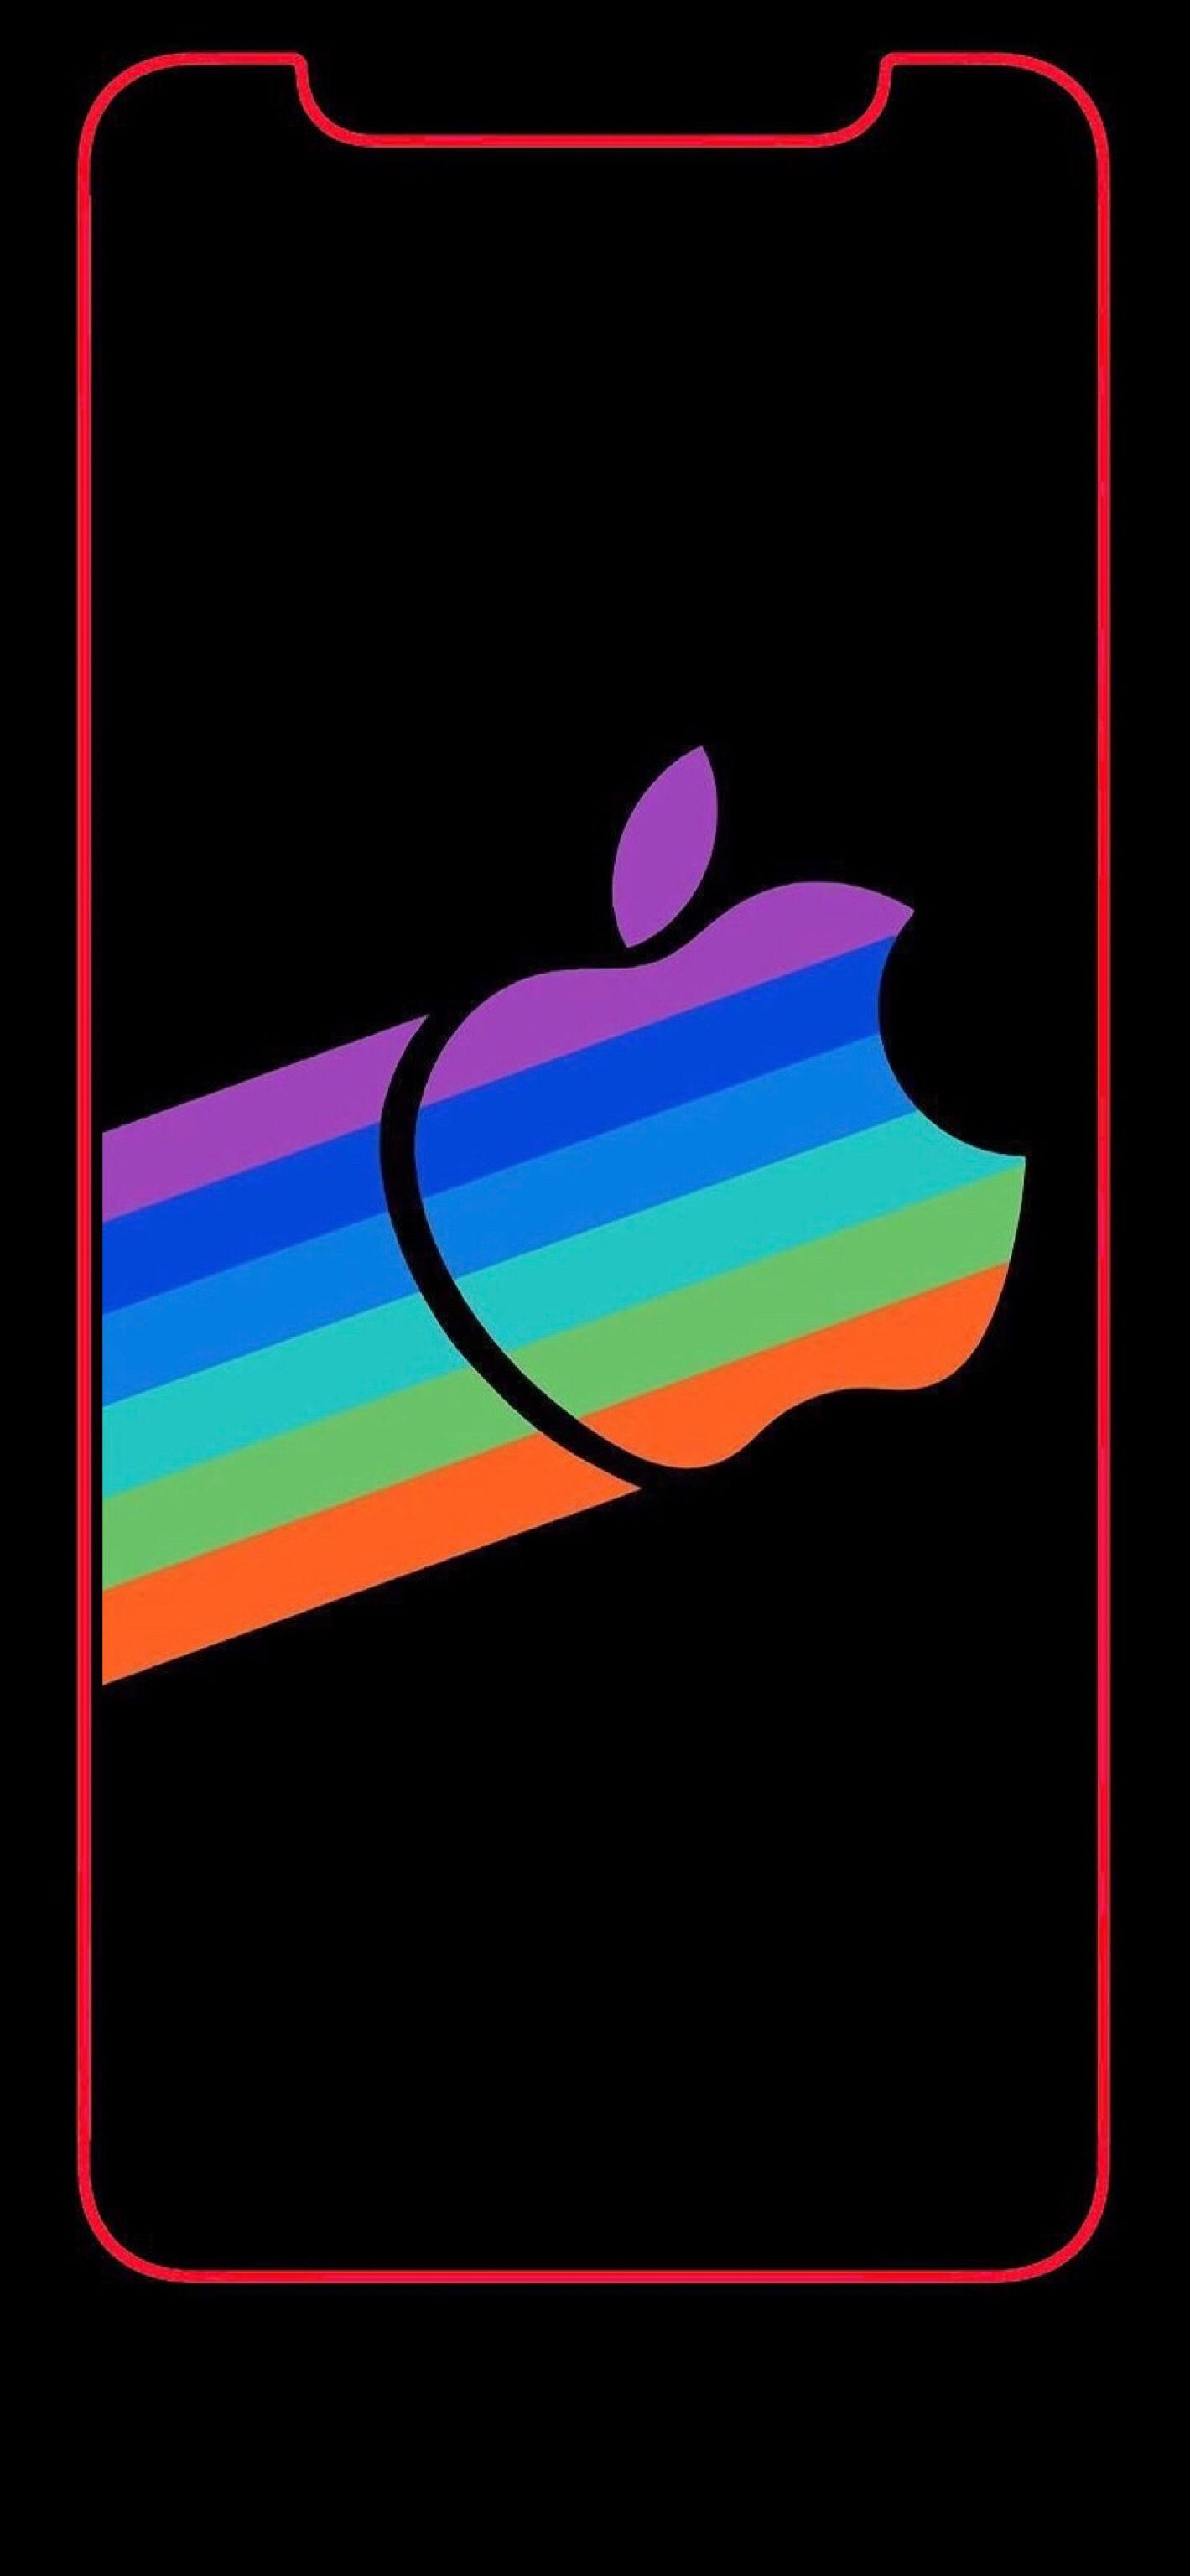 Wallpaper Iphone X Apple Logo Rainbow 1 Apple Iphone Wallpaper